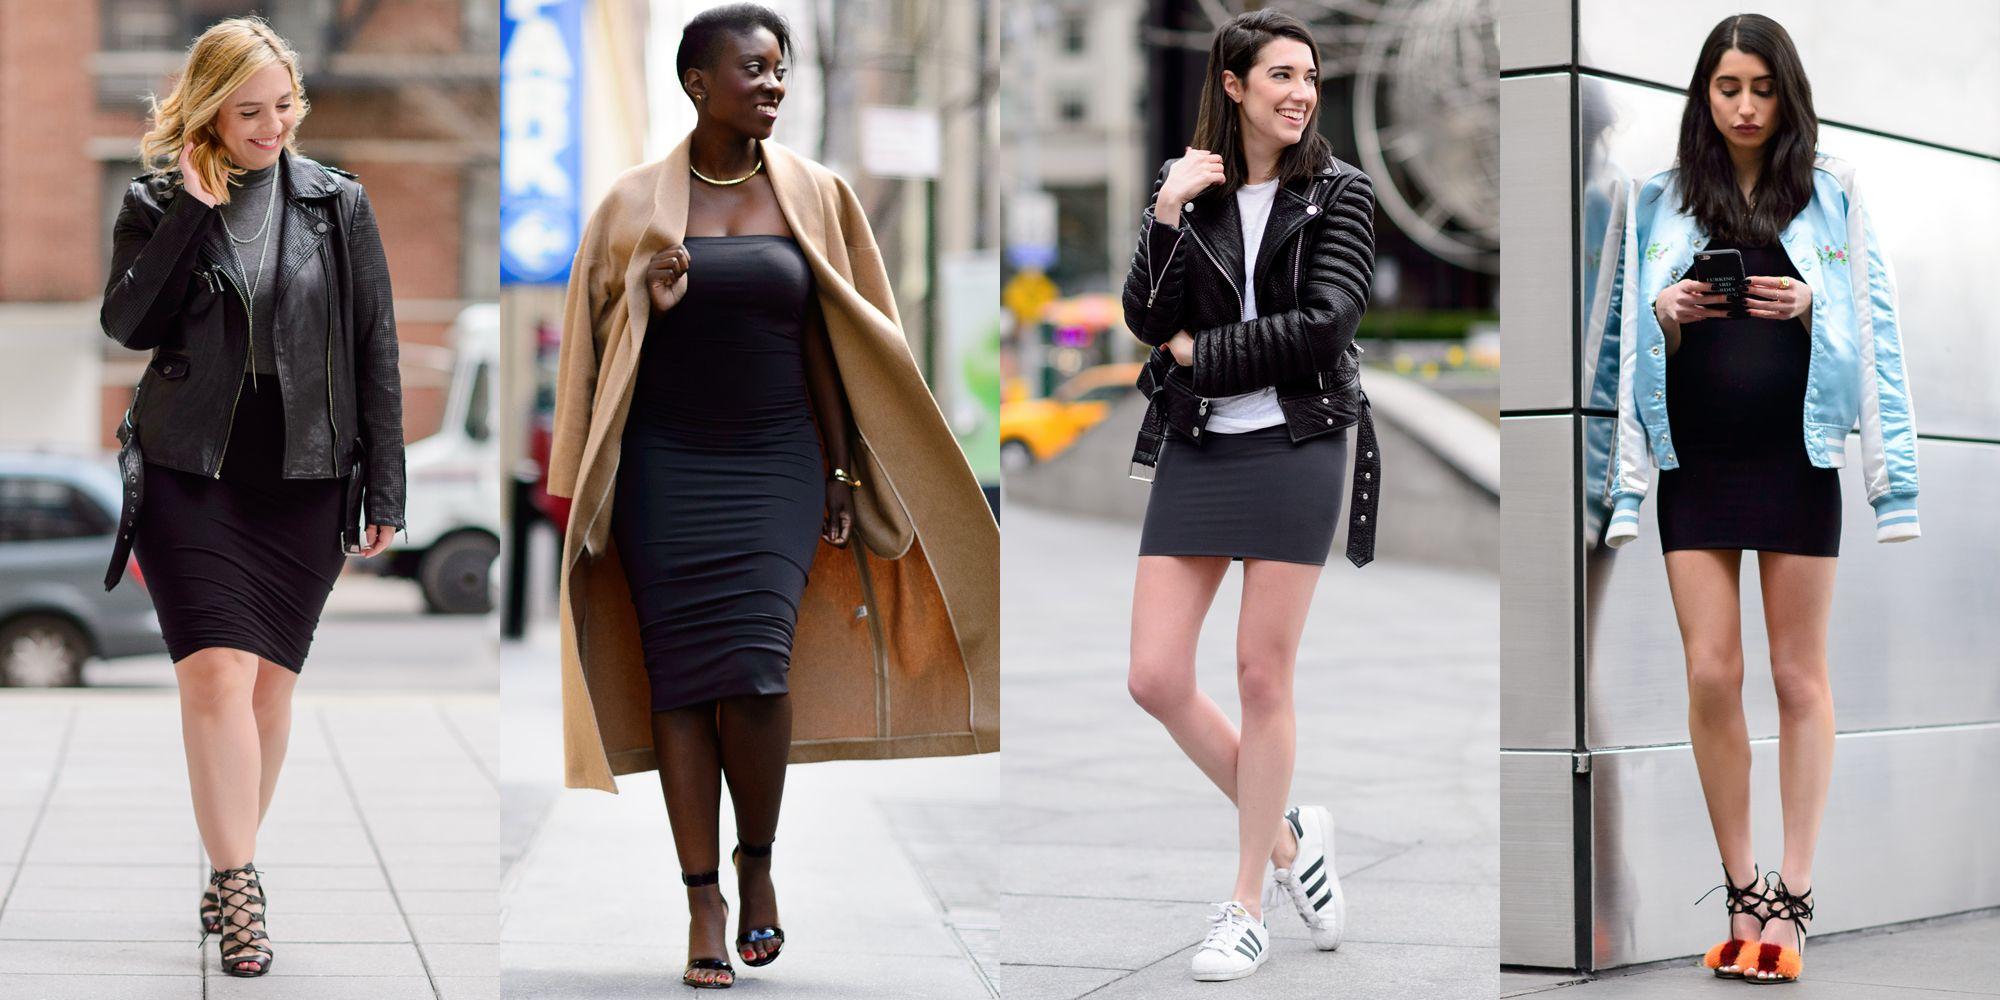 d5a5c40e2e3b Favorit Kim Kardashian s Wolford Dress - How to Wear Wolford Fatal Dress  MJ78